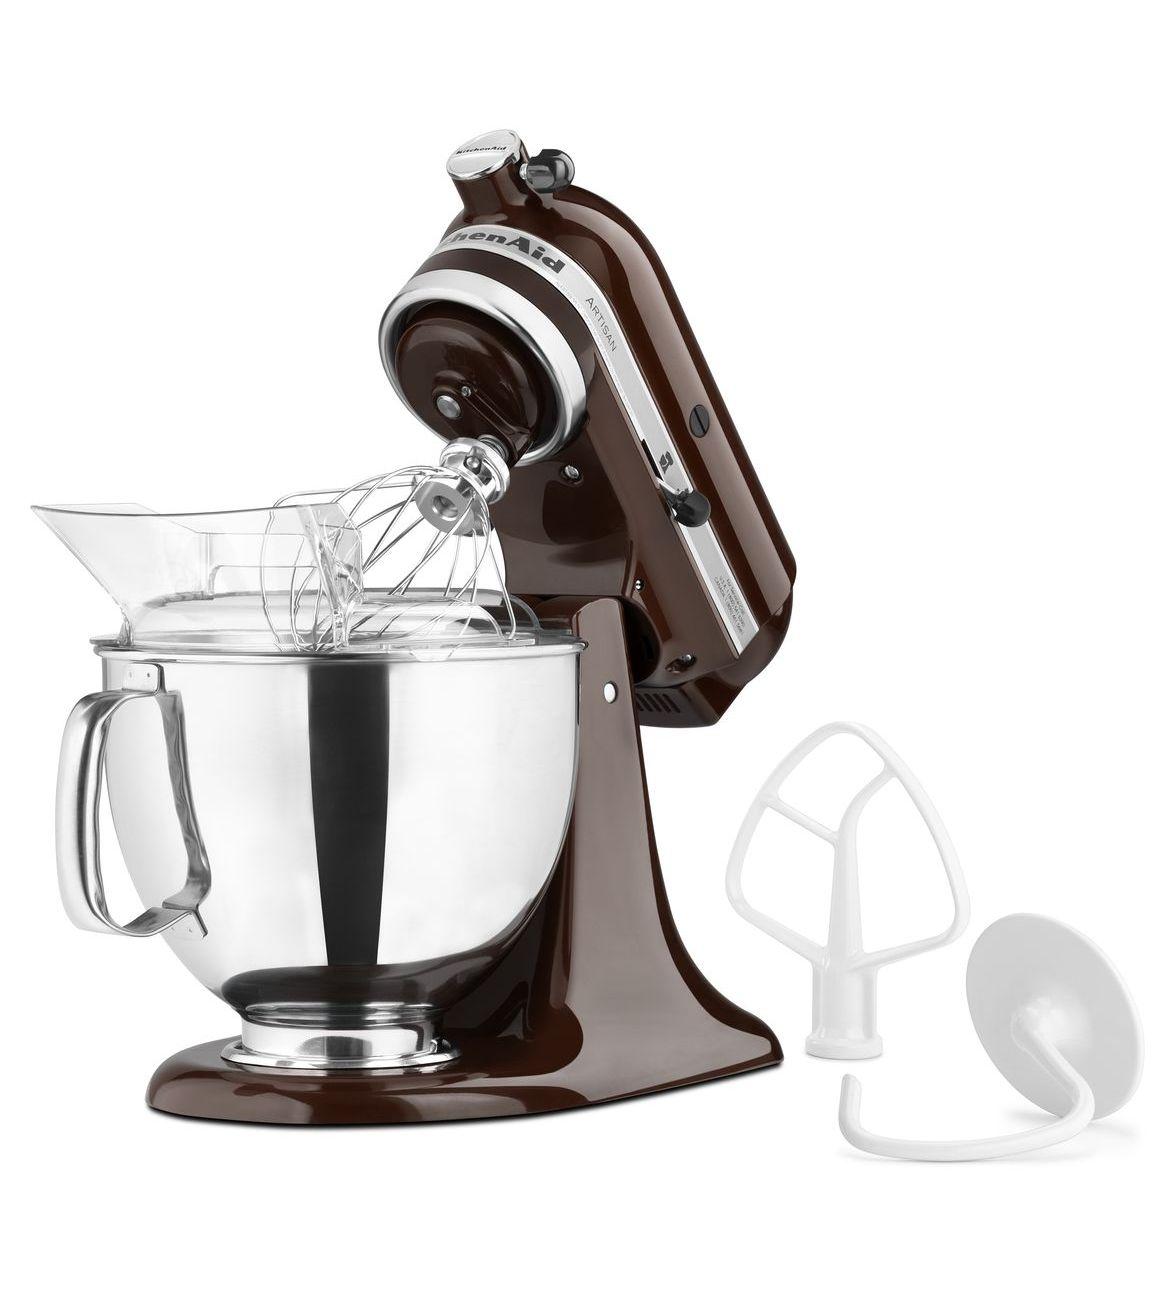 Ki Ki Kitchenaid Mixer Colors - Kitchen aid 5 qt artisan series stand mixer